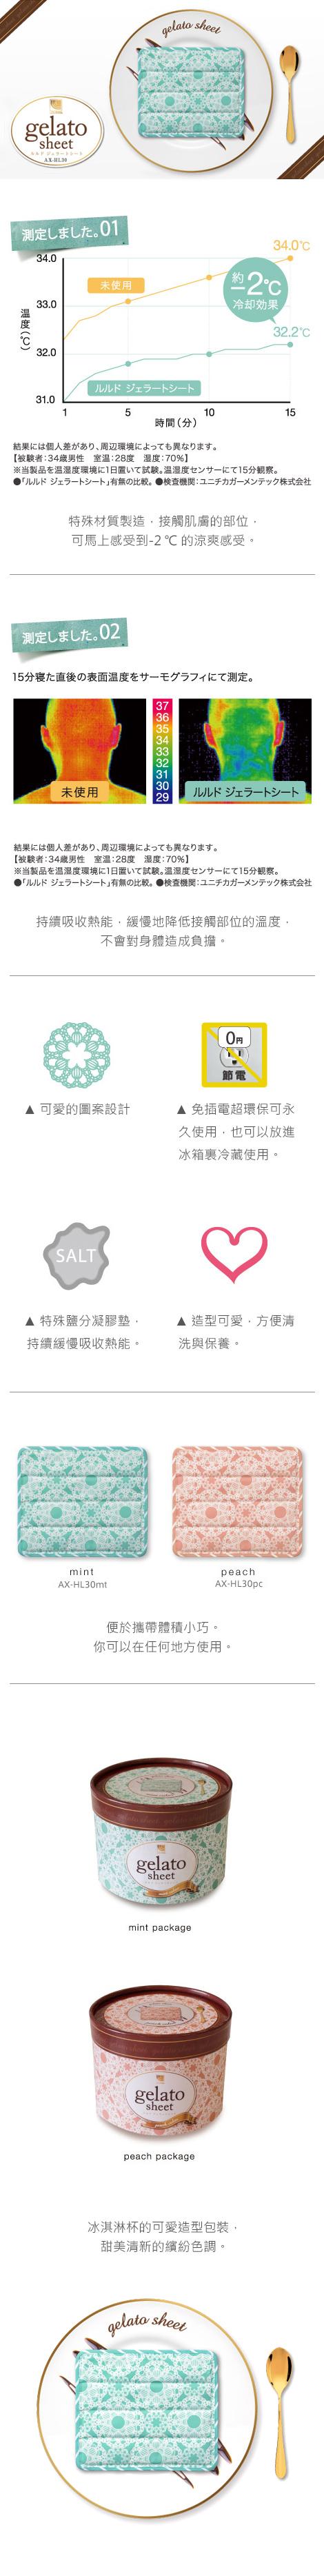 LOURDES 鹽分凝膠清涼墊 AX-HL30 (mt薄荷綠)